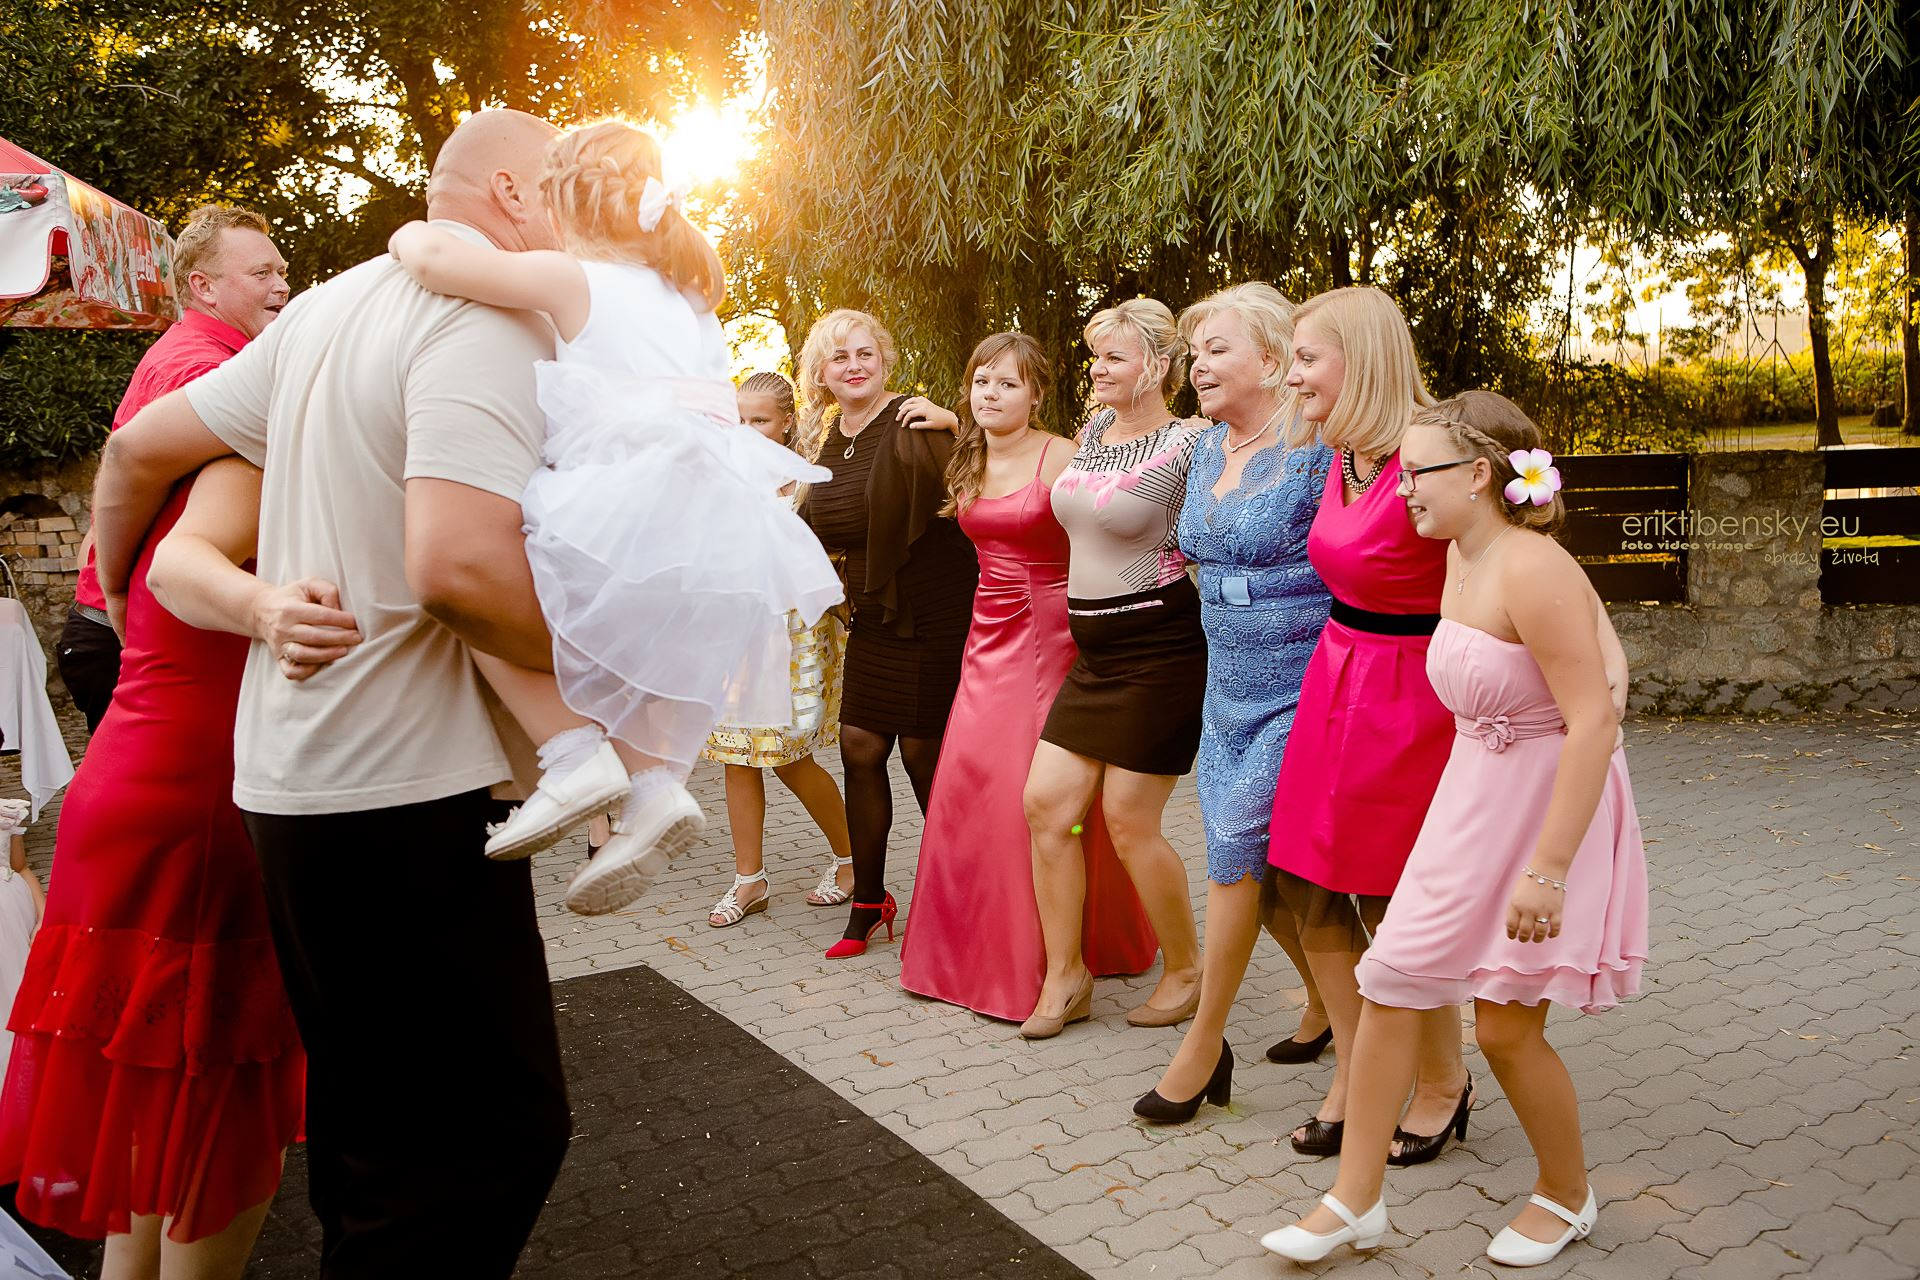 eriktibensky-eu-svadobny-fotograf-wedding-photographer-3052